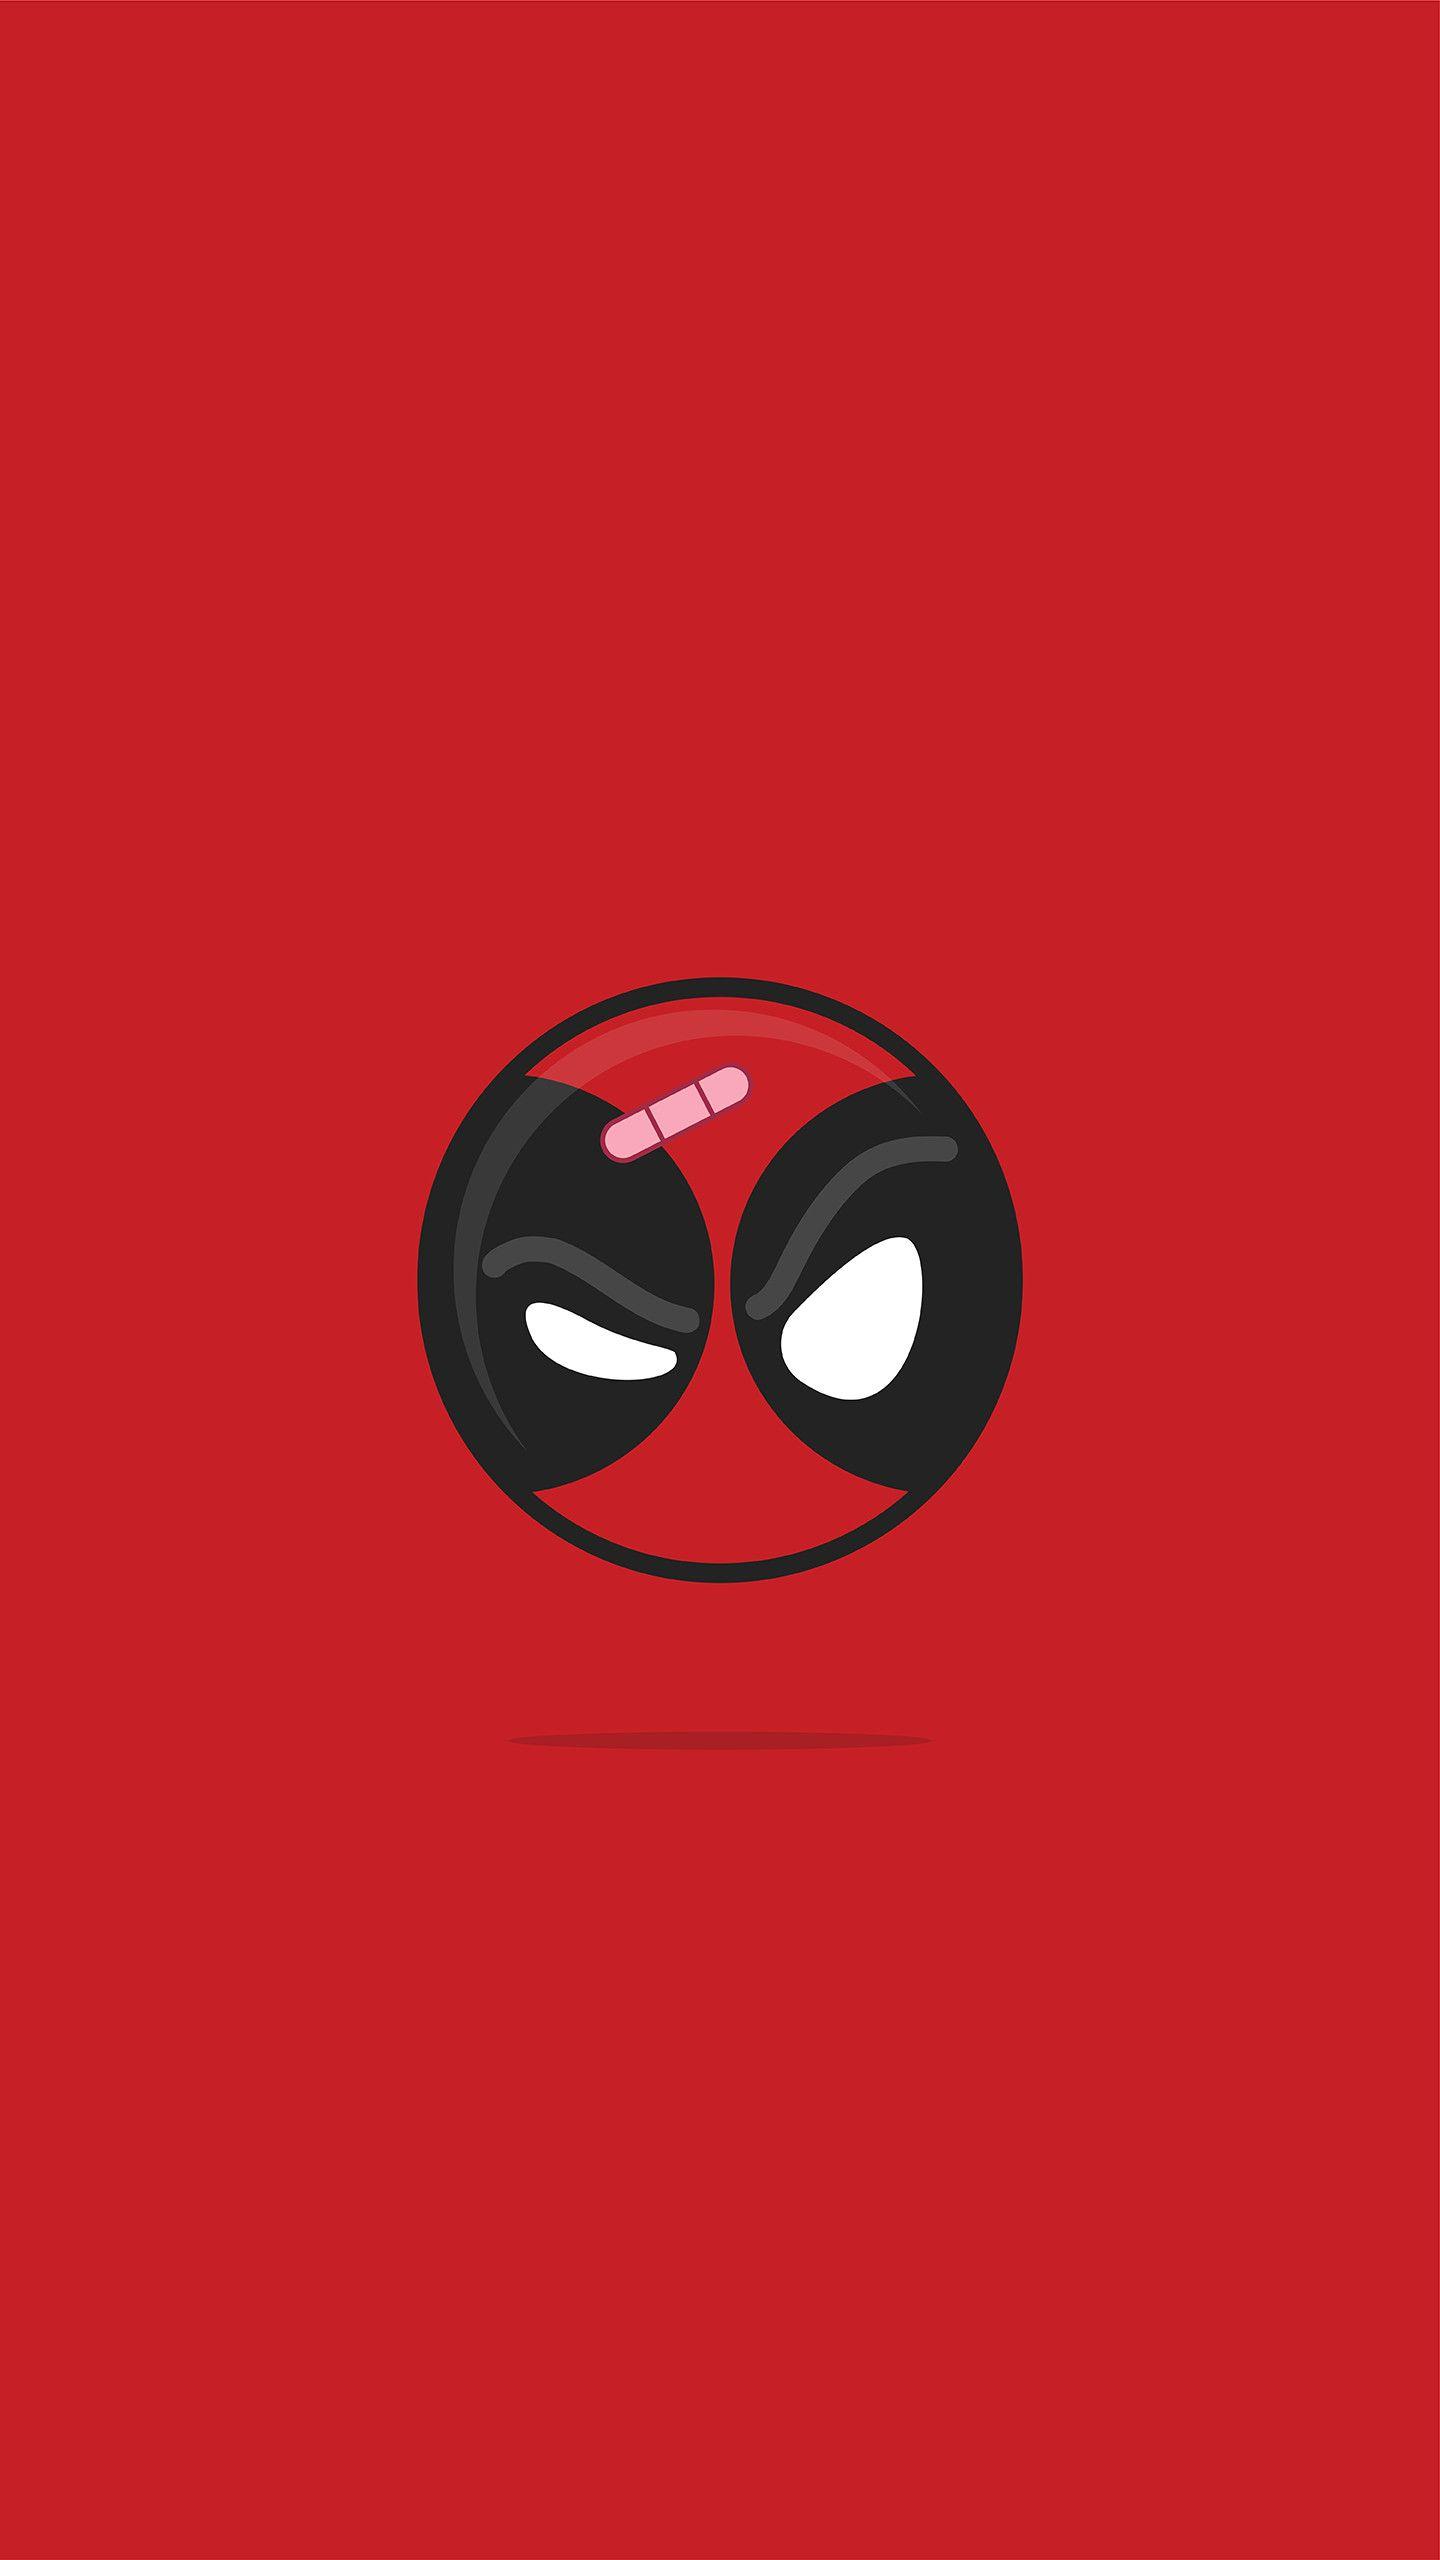 New Deadpool Minimal Iphone Wallpaper In 2020 Deadpool Wallpaper Deadpool Wallpaper Iphone Deadpool Art